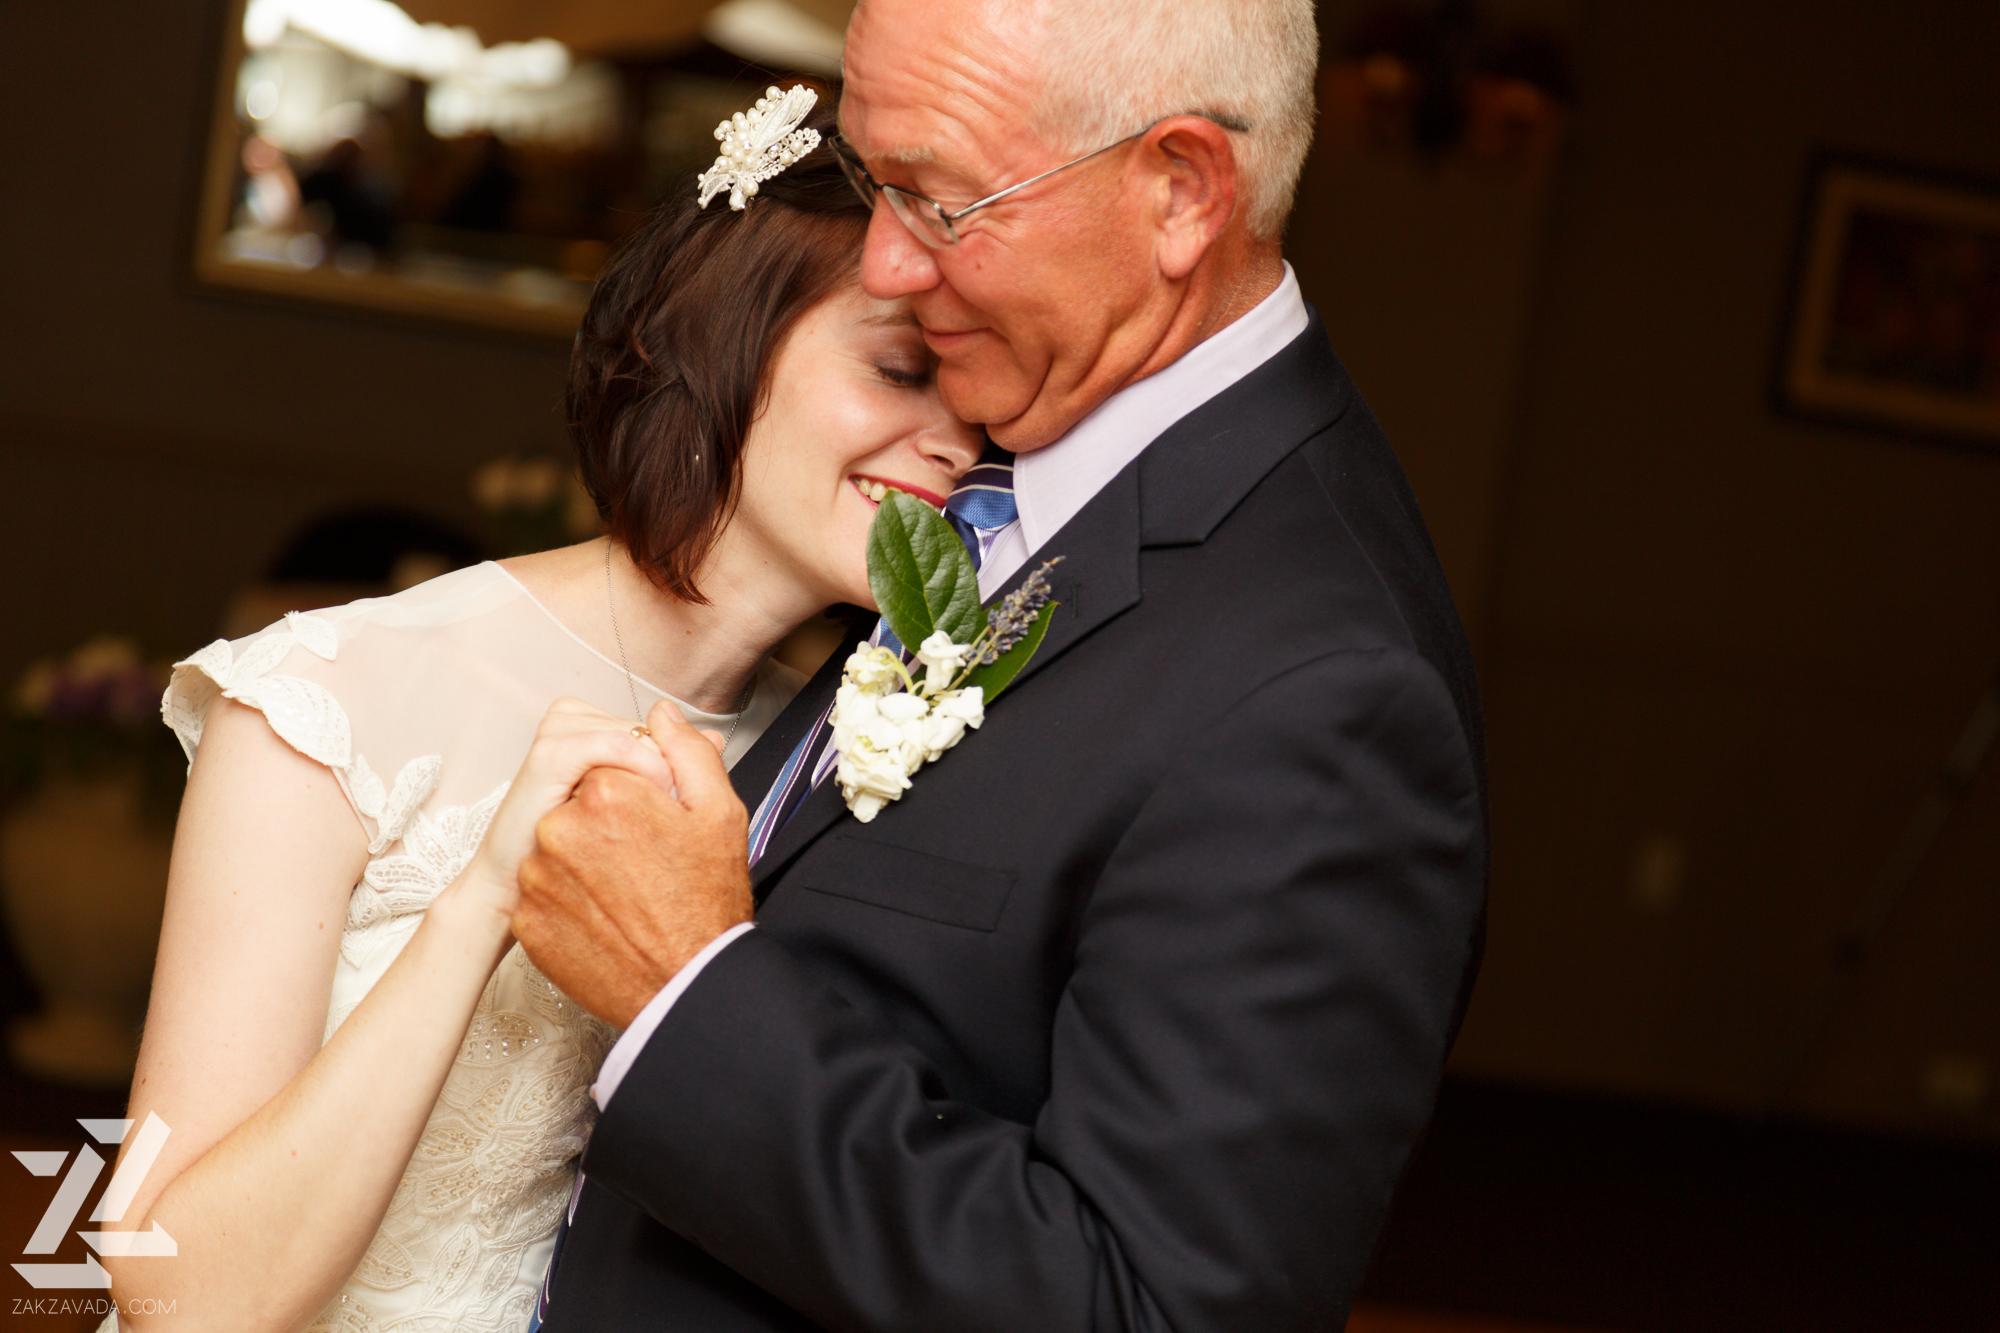 scranton-wedding-photography-zak-zavada-ruddyBelcastroWedding-867.jpg